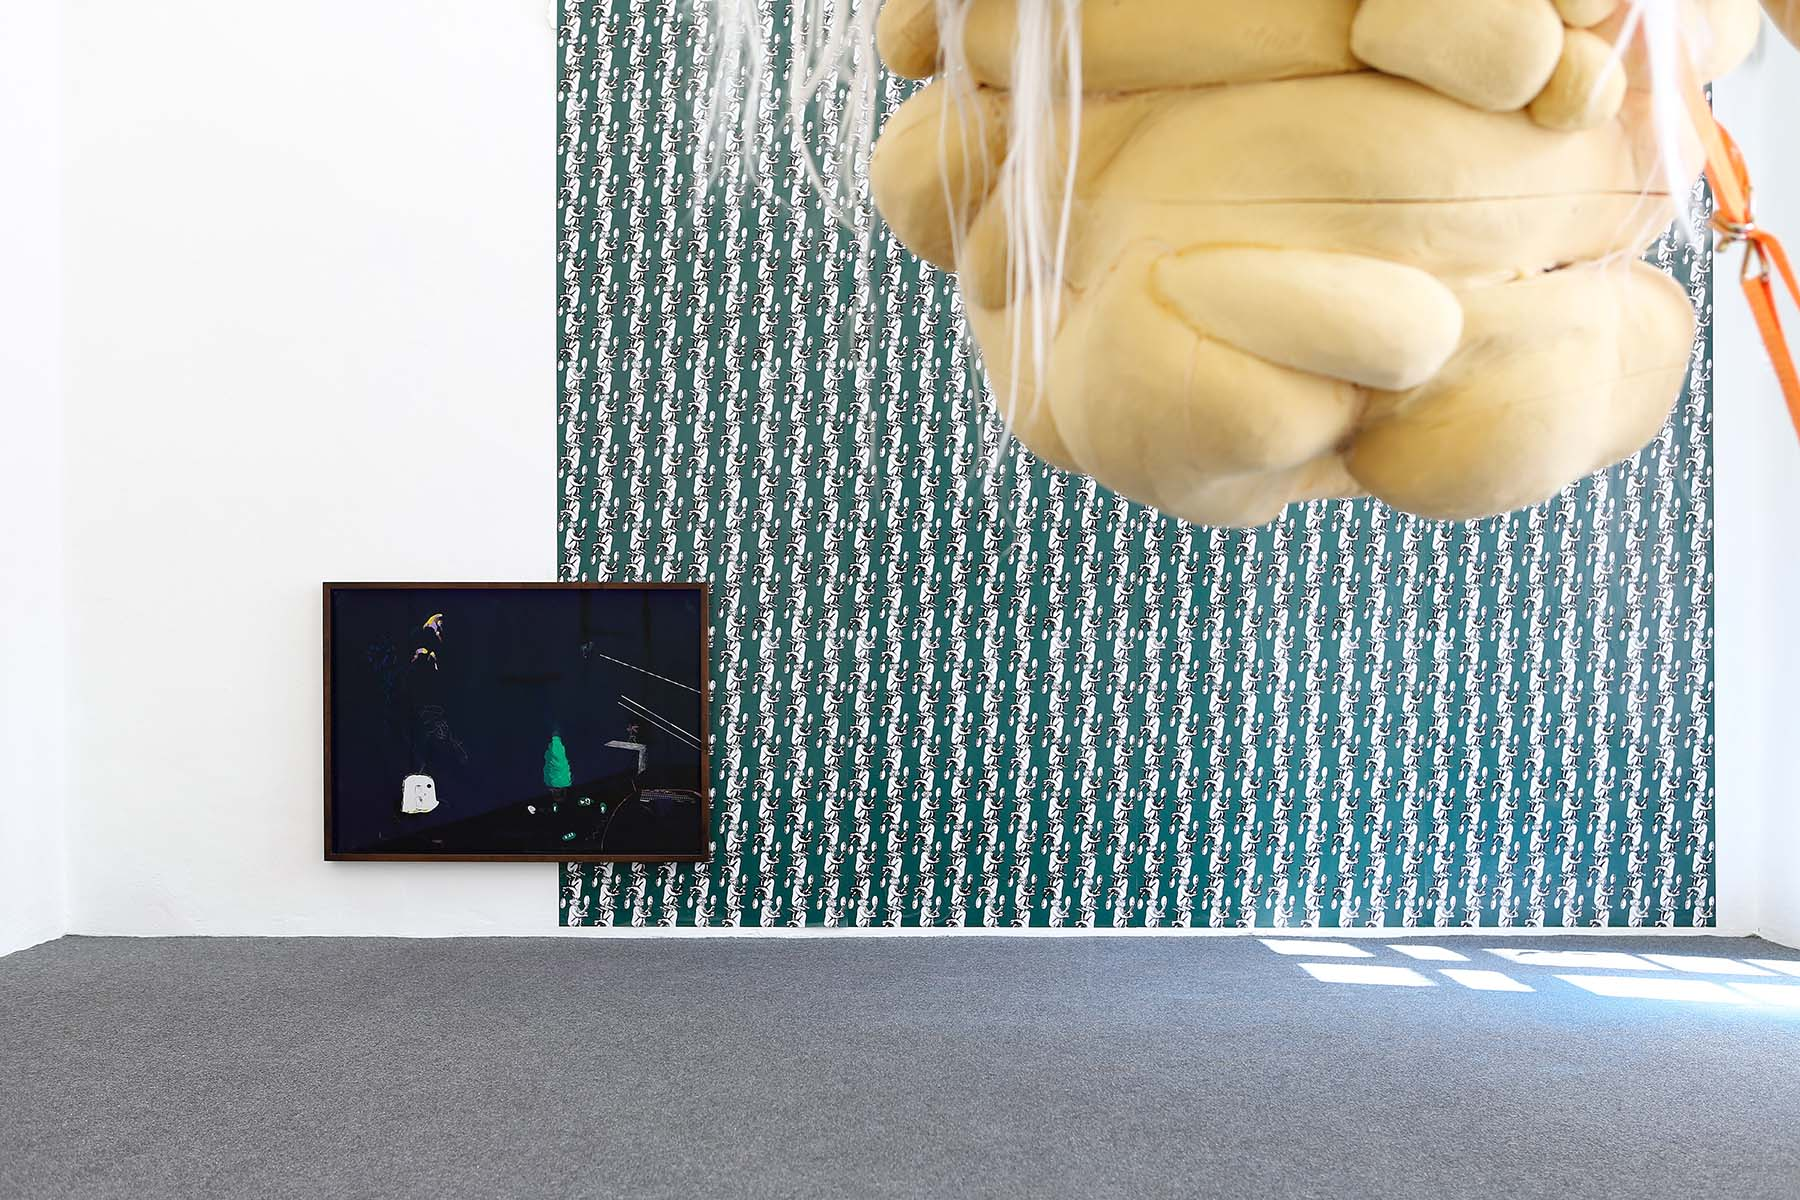 viewing room for art galleries, kunst verein eisenstadt